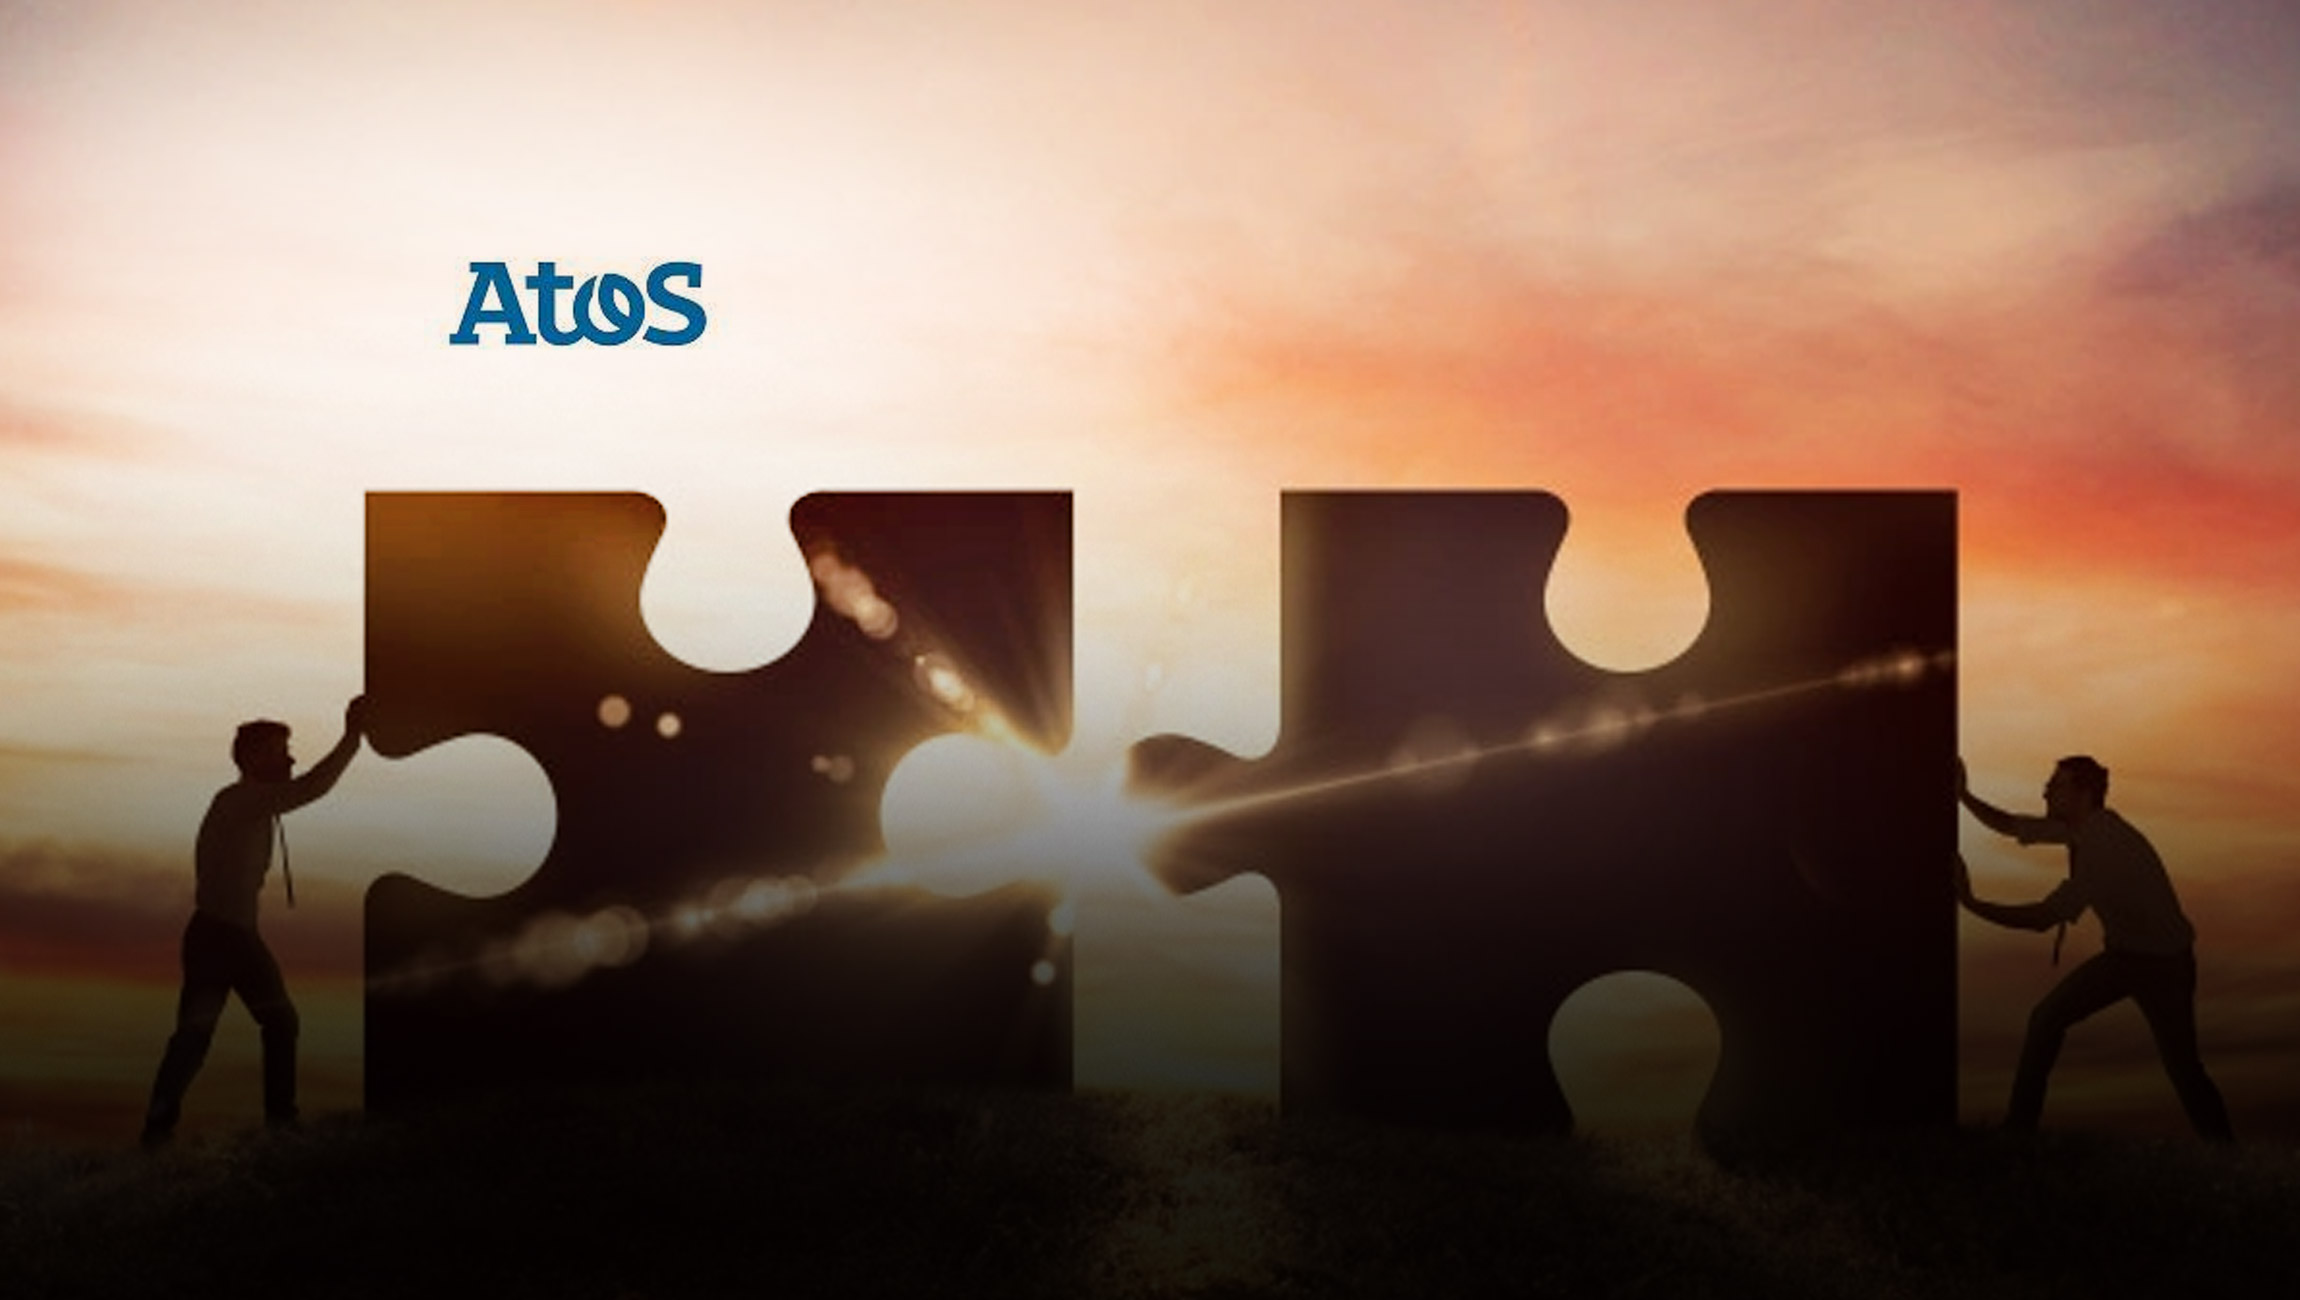 Atos-announces-extended-collaboration-with-Amazon-Web-Services-as-Atos-OneCloud-partner